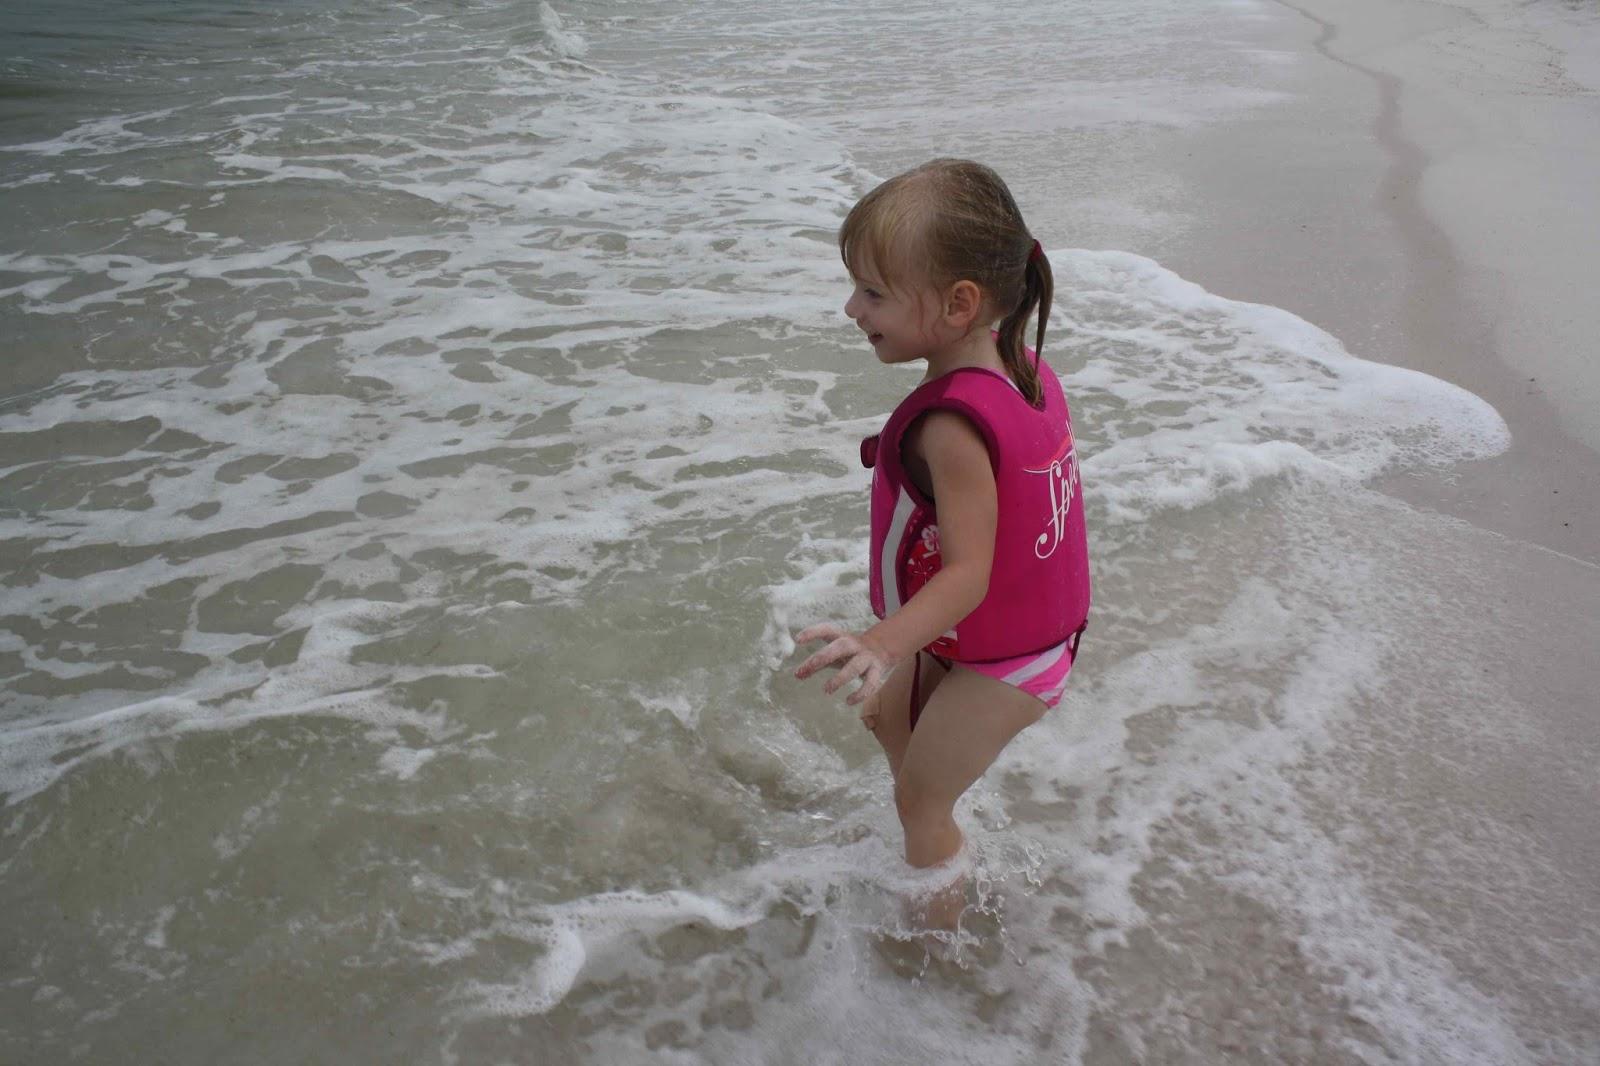 cz little girls pee